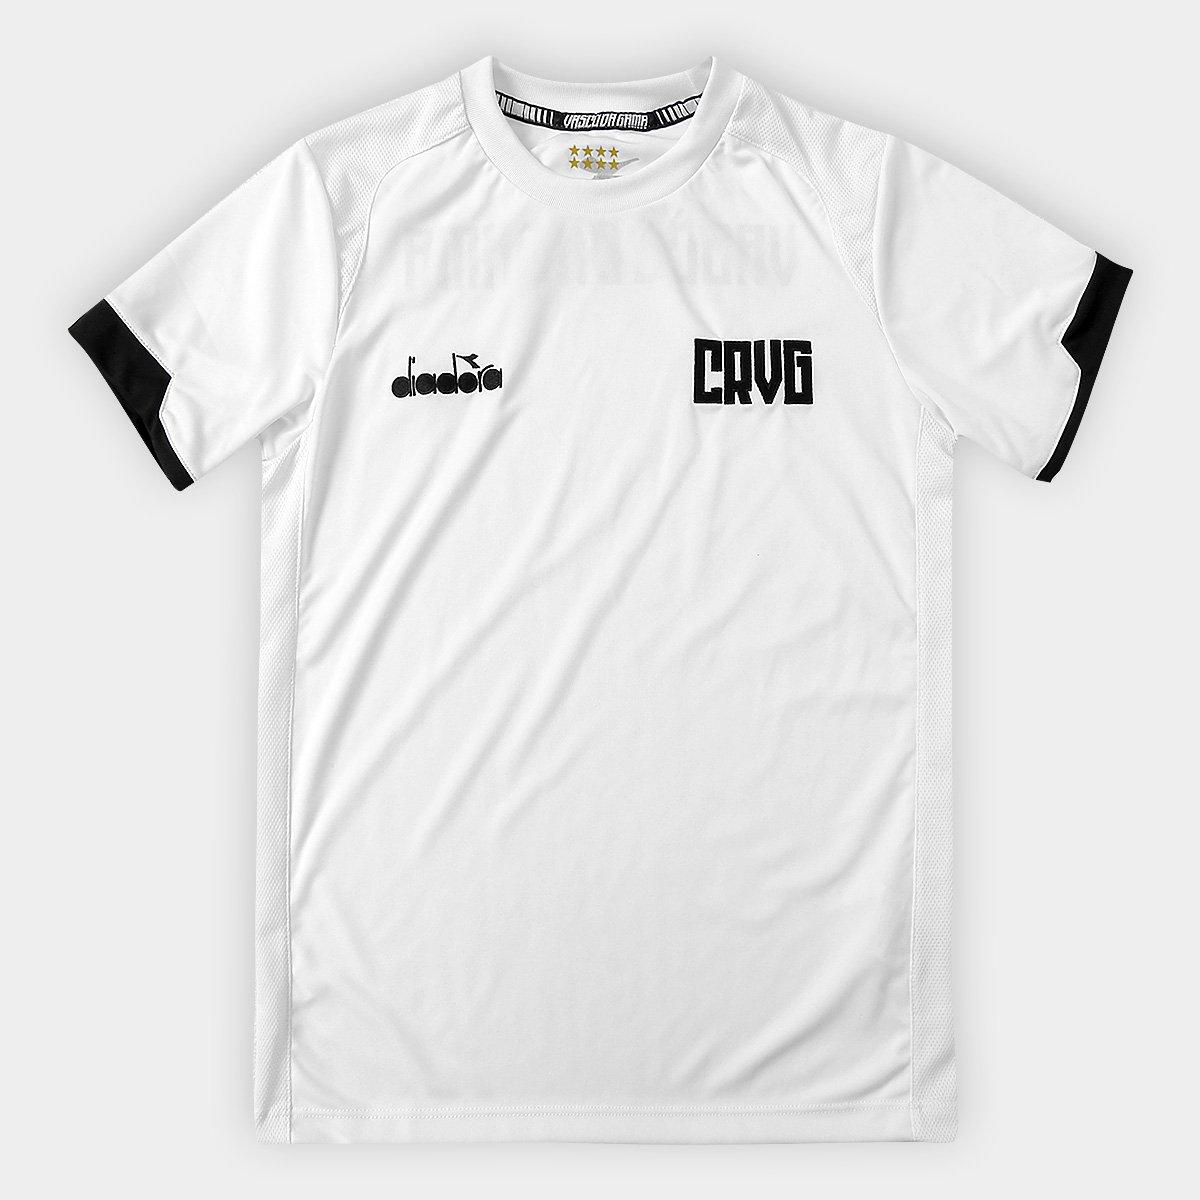 b435d1cb0c Camisa Vasco Treino Infantil 19 20 Diadora - Branco